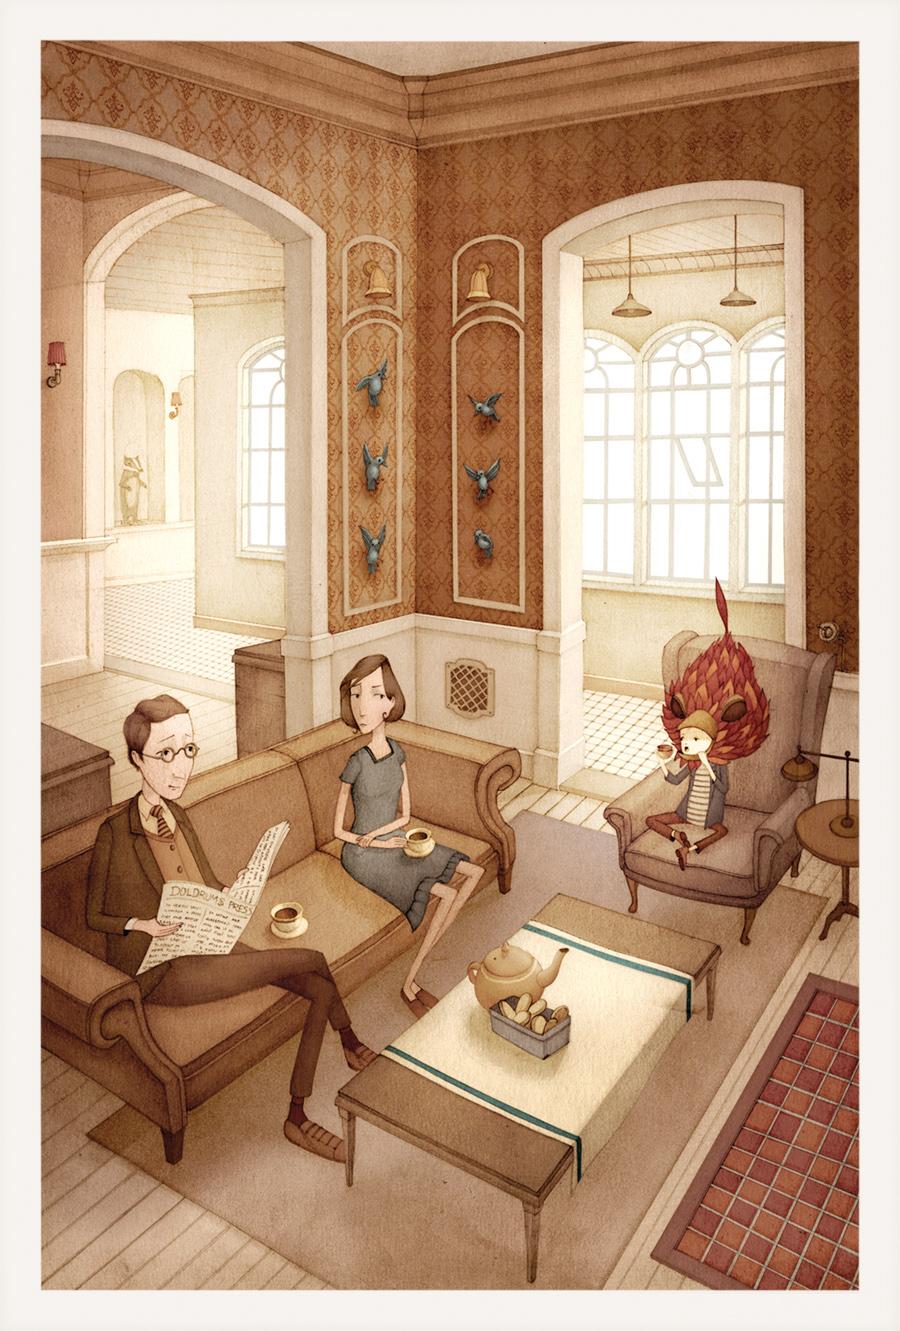 The Doldrums by Nicholas Gannon